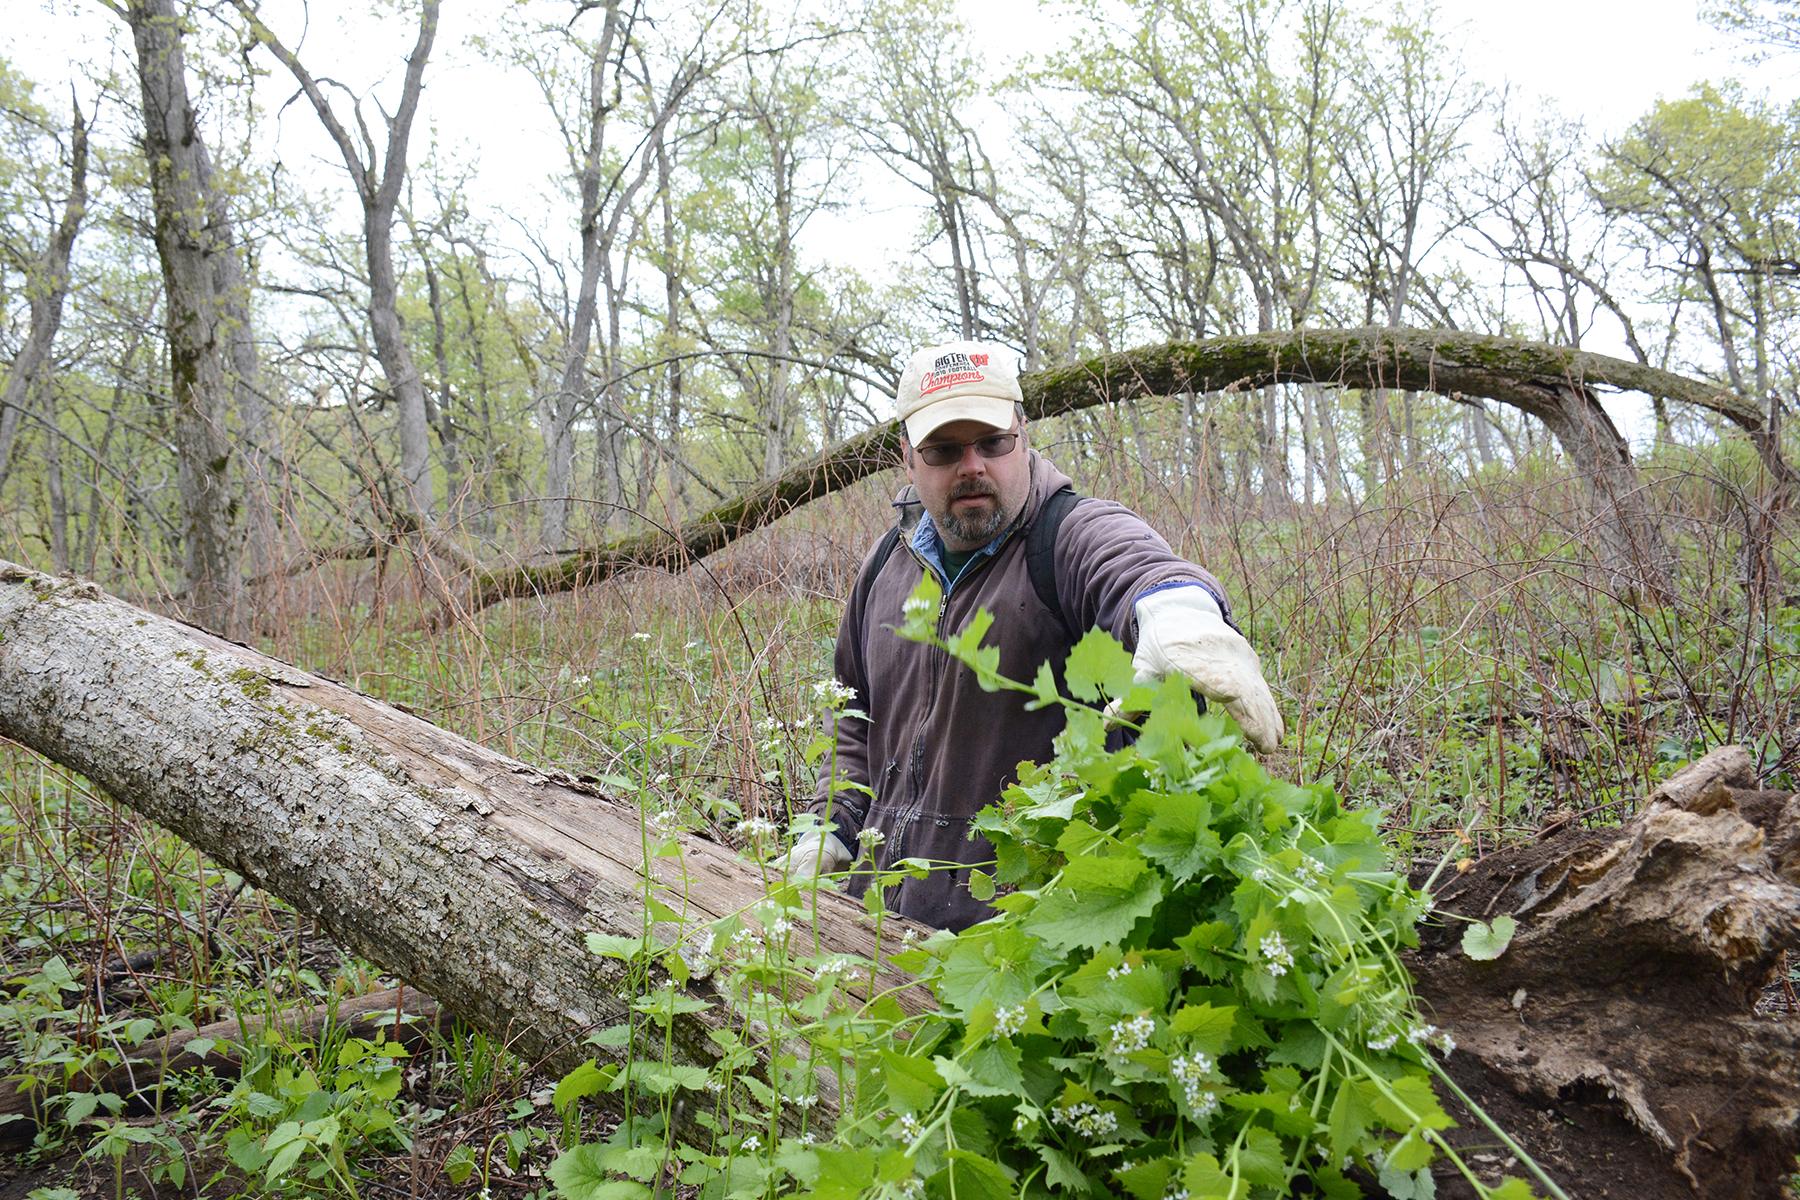 Jeff Meyers piles up invasive garlic mustard during a volunteer work day at Muehllehner Addition - Barneveld Prairie, Wis. May 14, 2016.